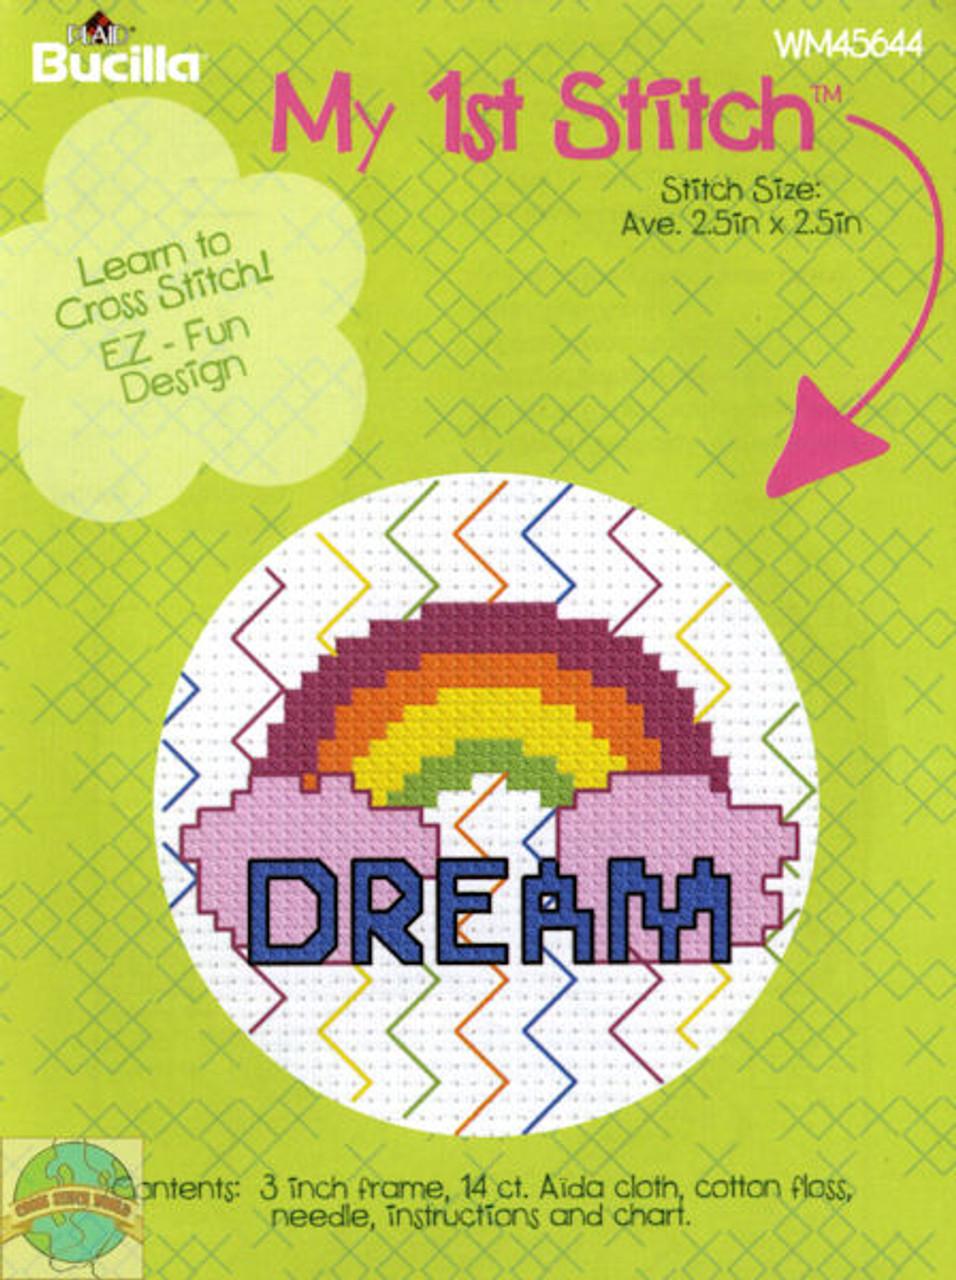 My 1st Stitch - Dream Rainbow